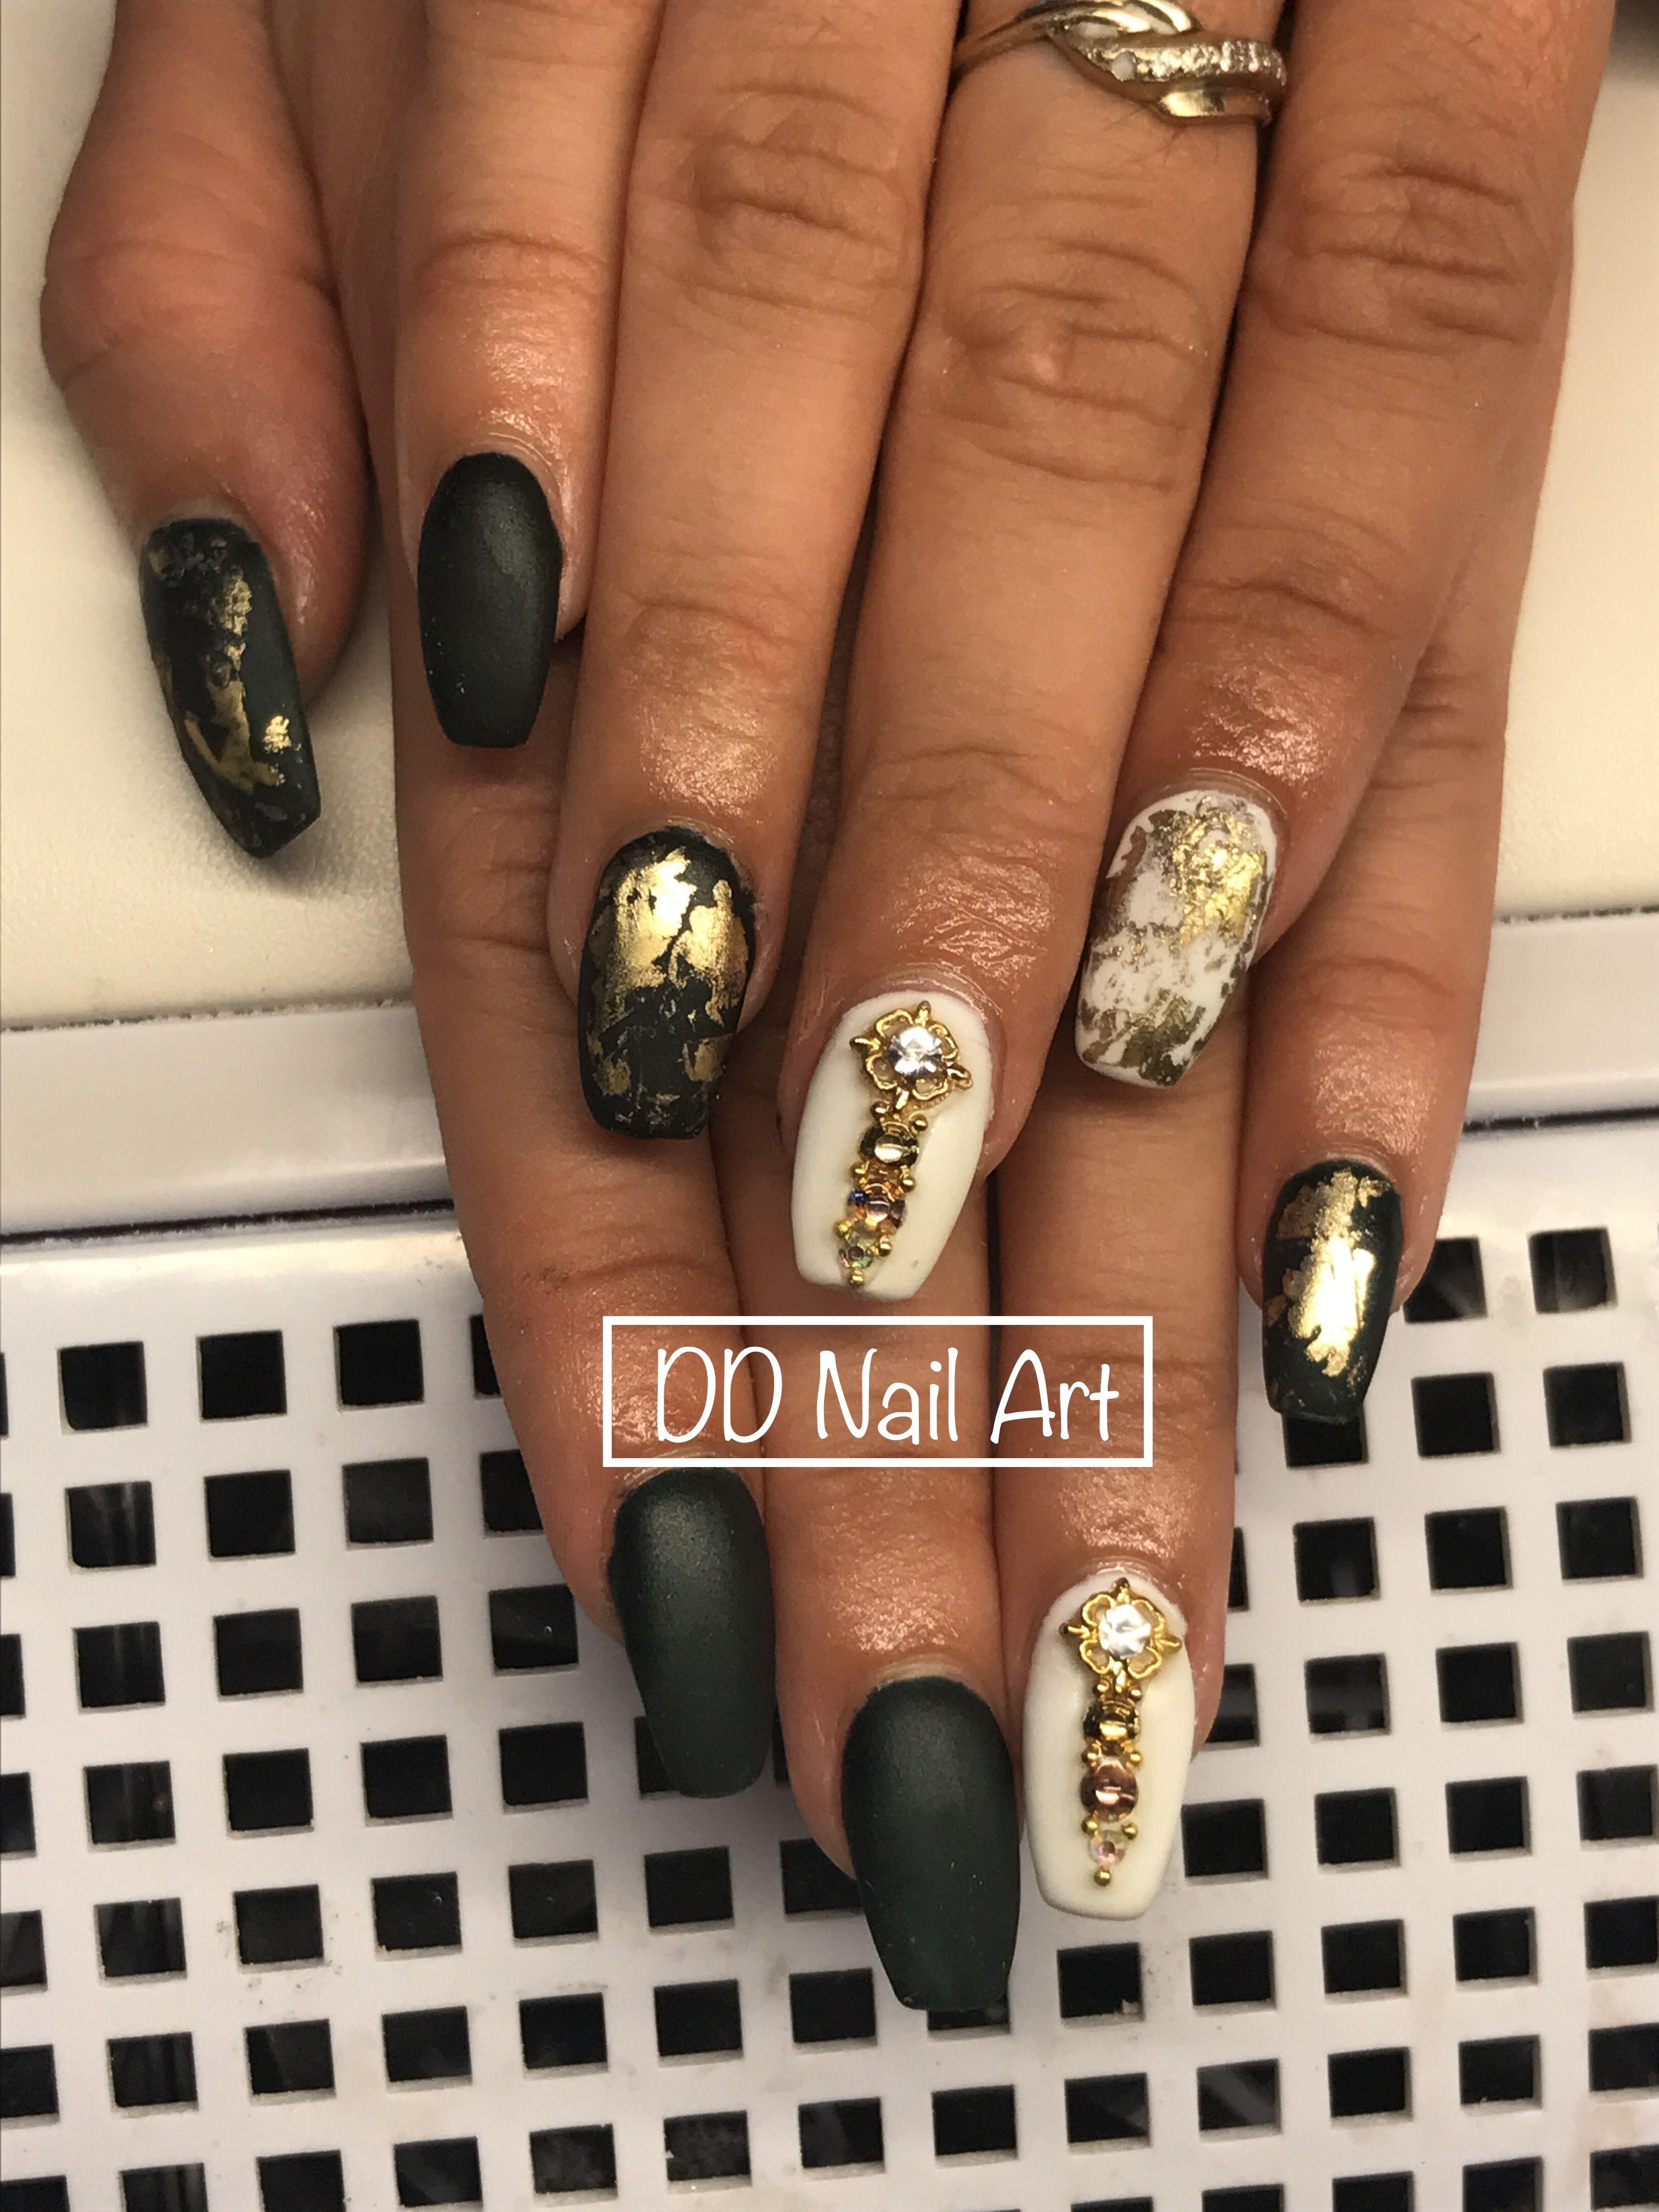 Coffin matte long nails design | DD nail art | Pinterest | Long nail ...